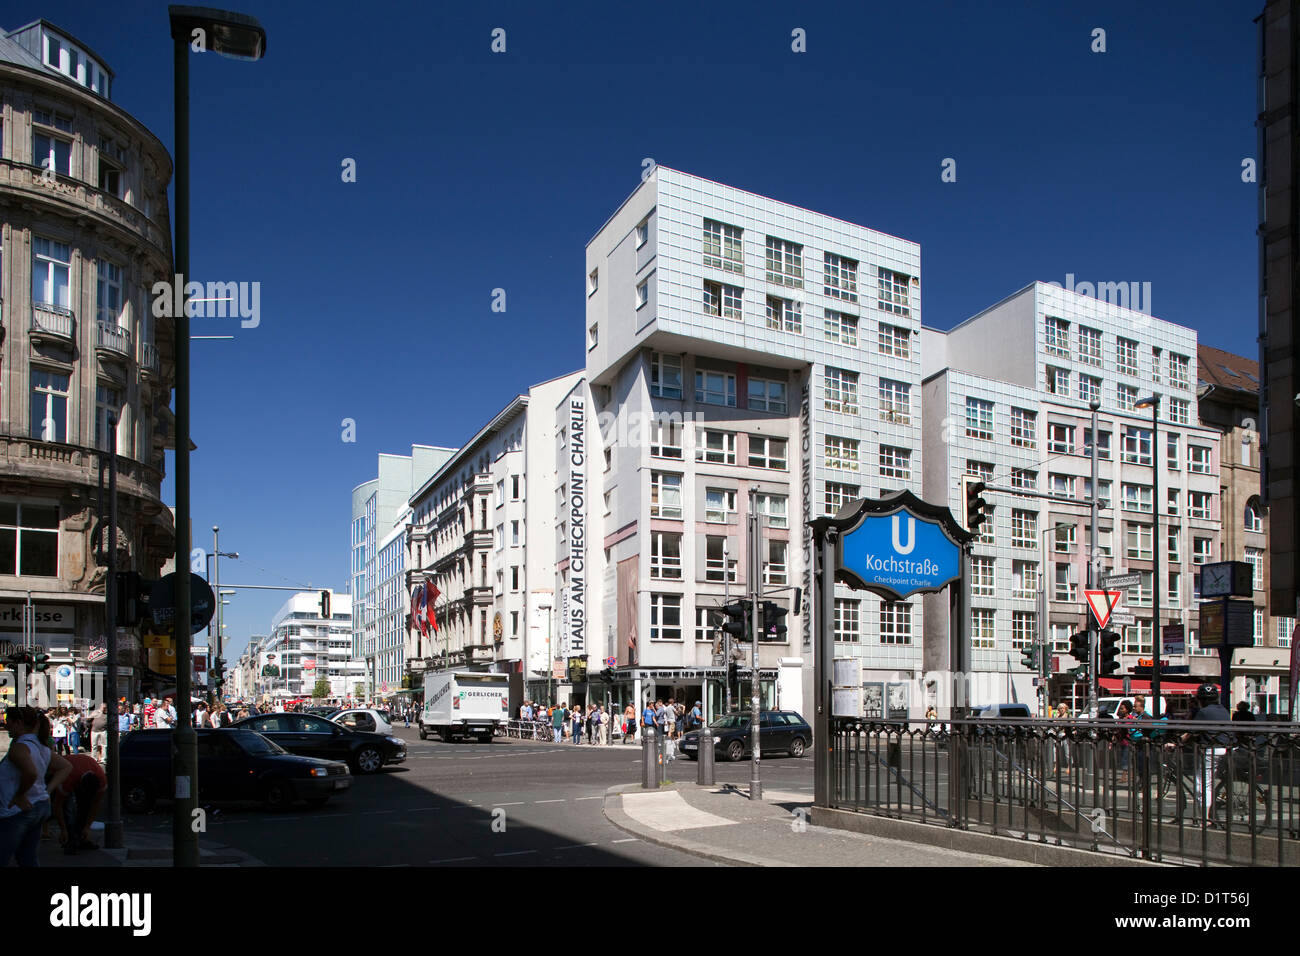 berlin germany metro station kochstrasse direction haus am stock photo royalty free image. Black Bedroom Furniture Sets. Home Design Ideas